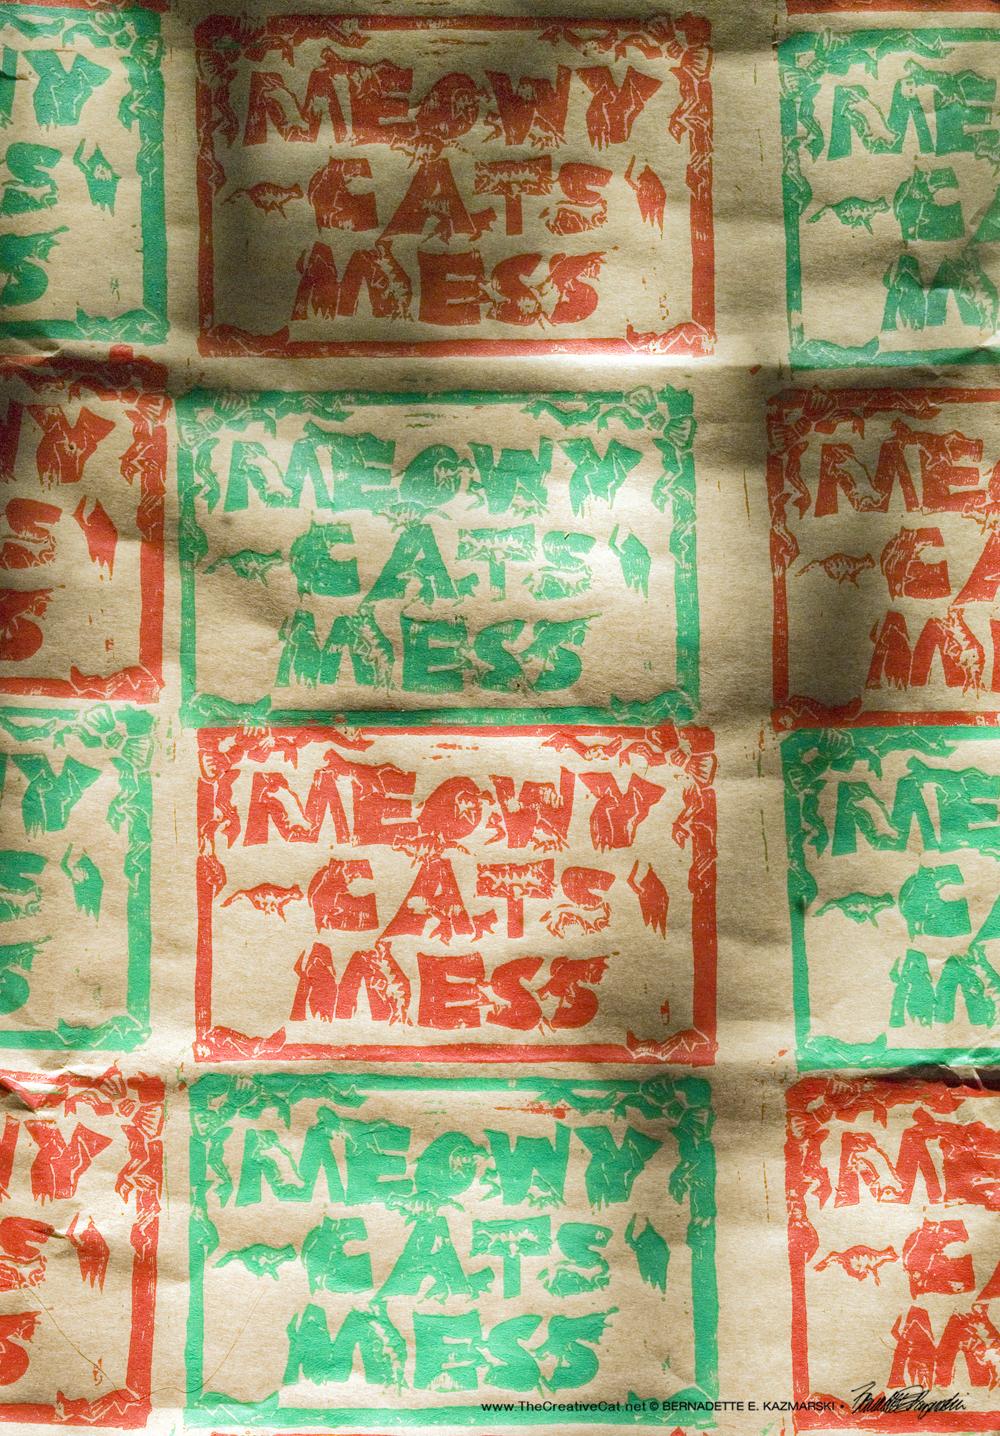 Meowy Cat's Mess pattern closeup.